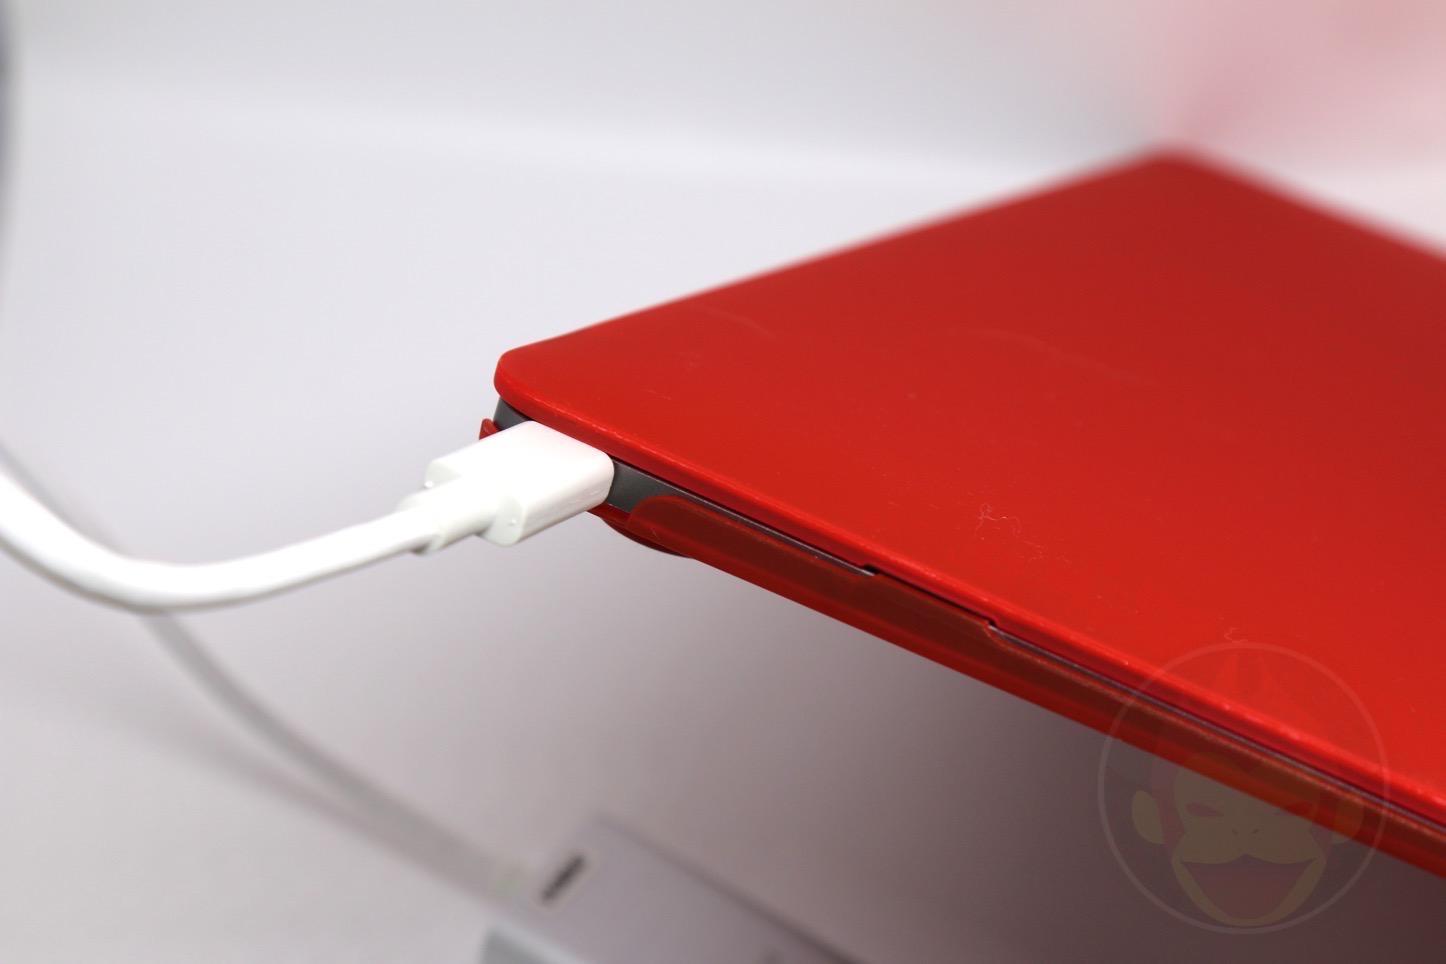 Anker-USB-C-Ethernet-Cable-08.jpg